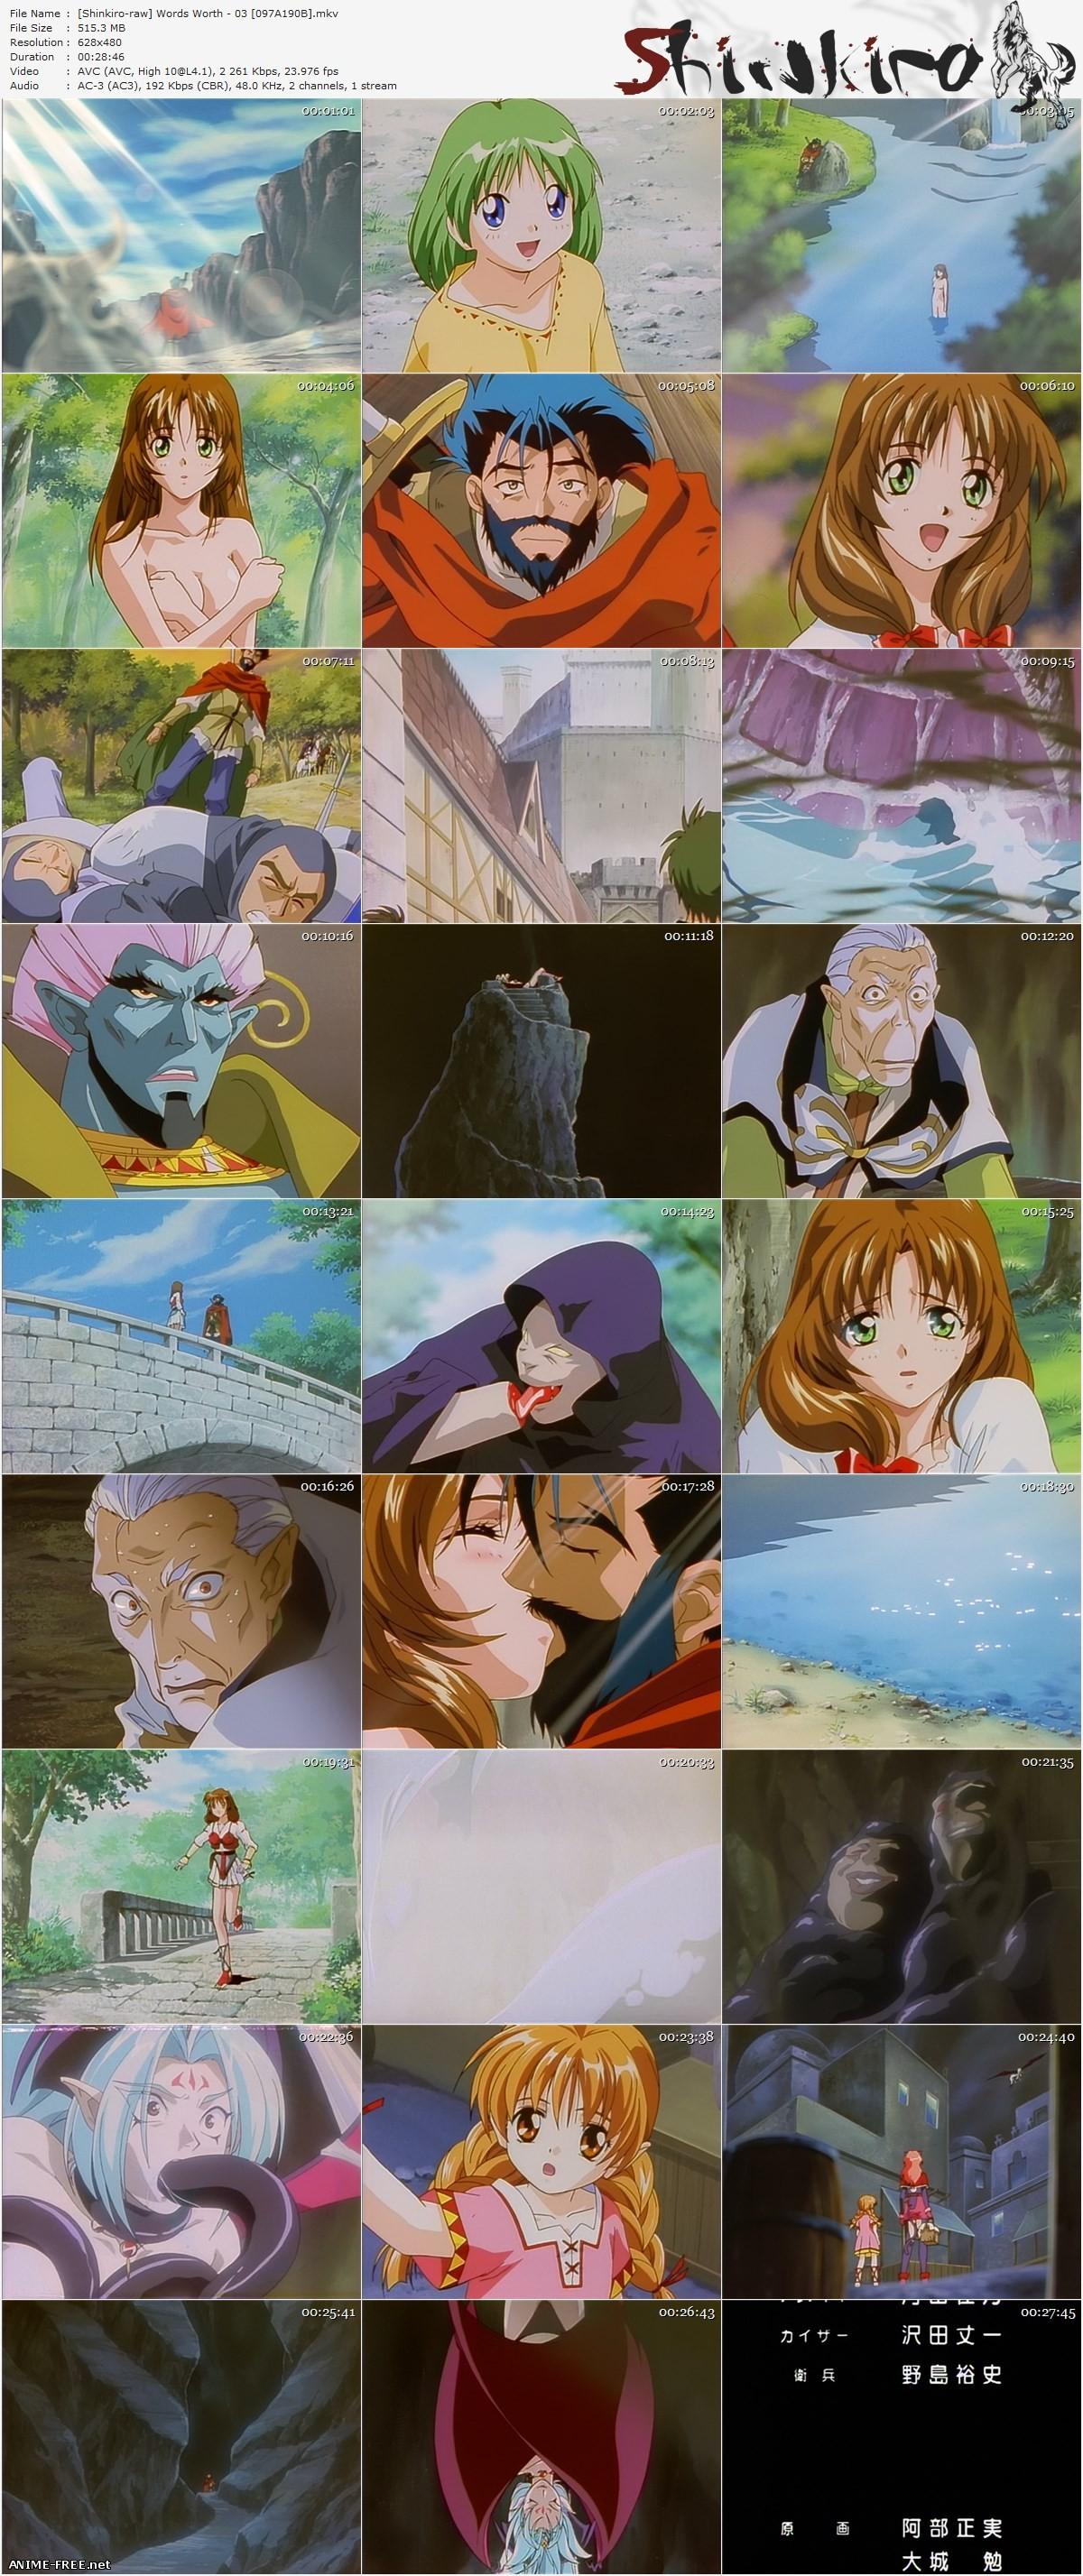 Words Worth + Words Worth Gaiden / Заветные слова + Заветные Слова - Происхождение [7 из 7] [RUS,ENG,JAP]  Anime Hentai